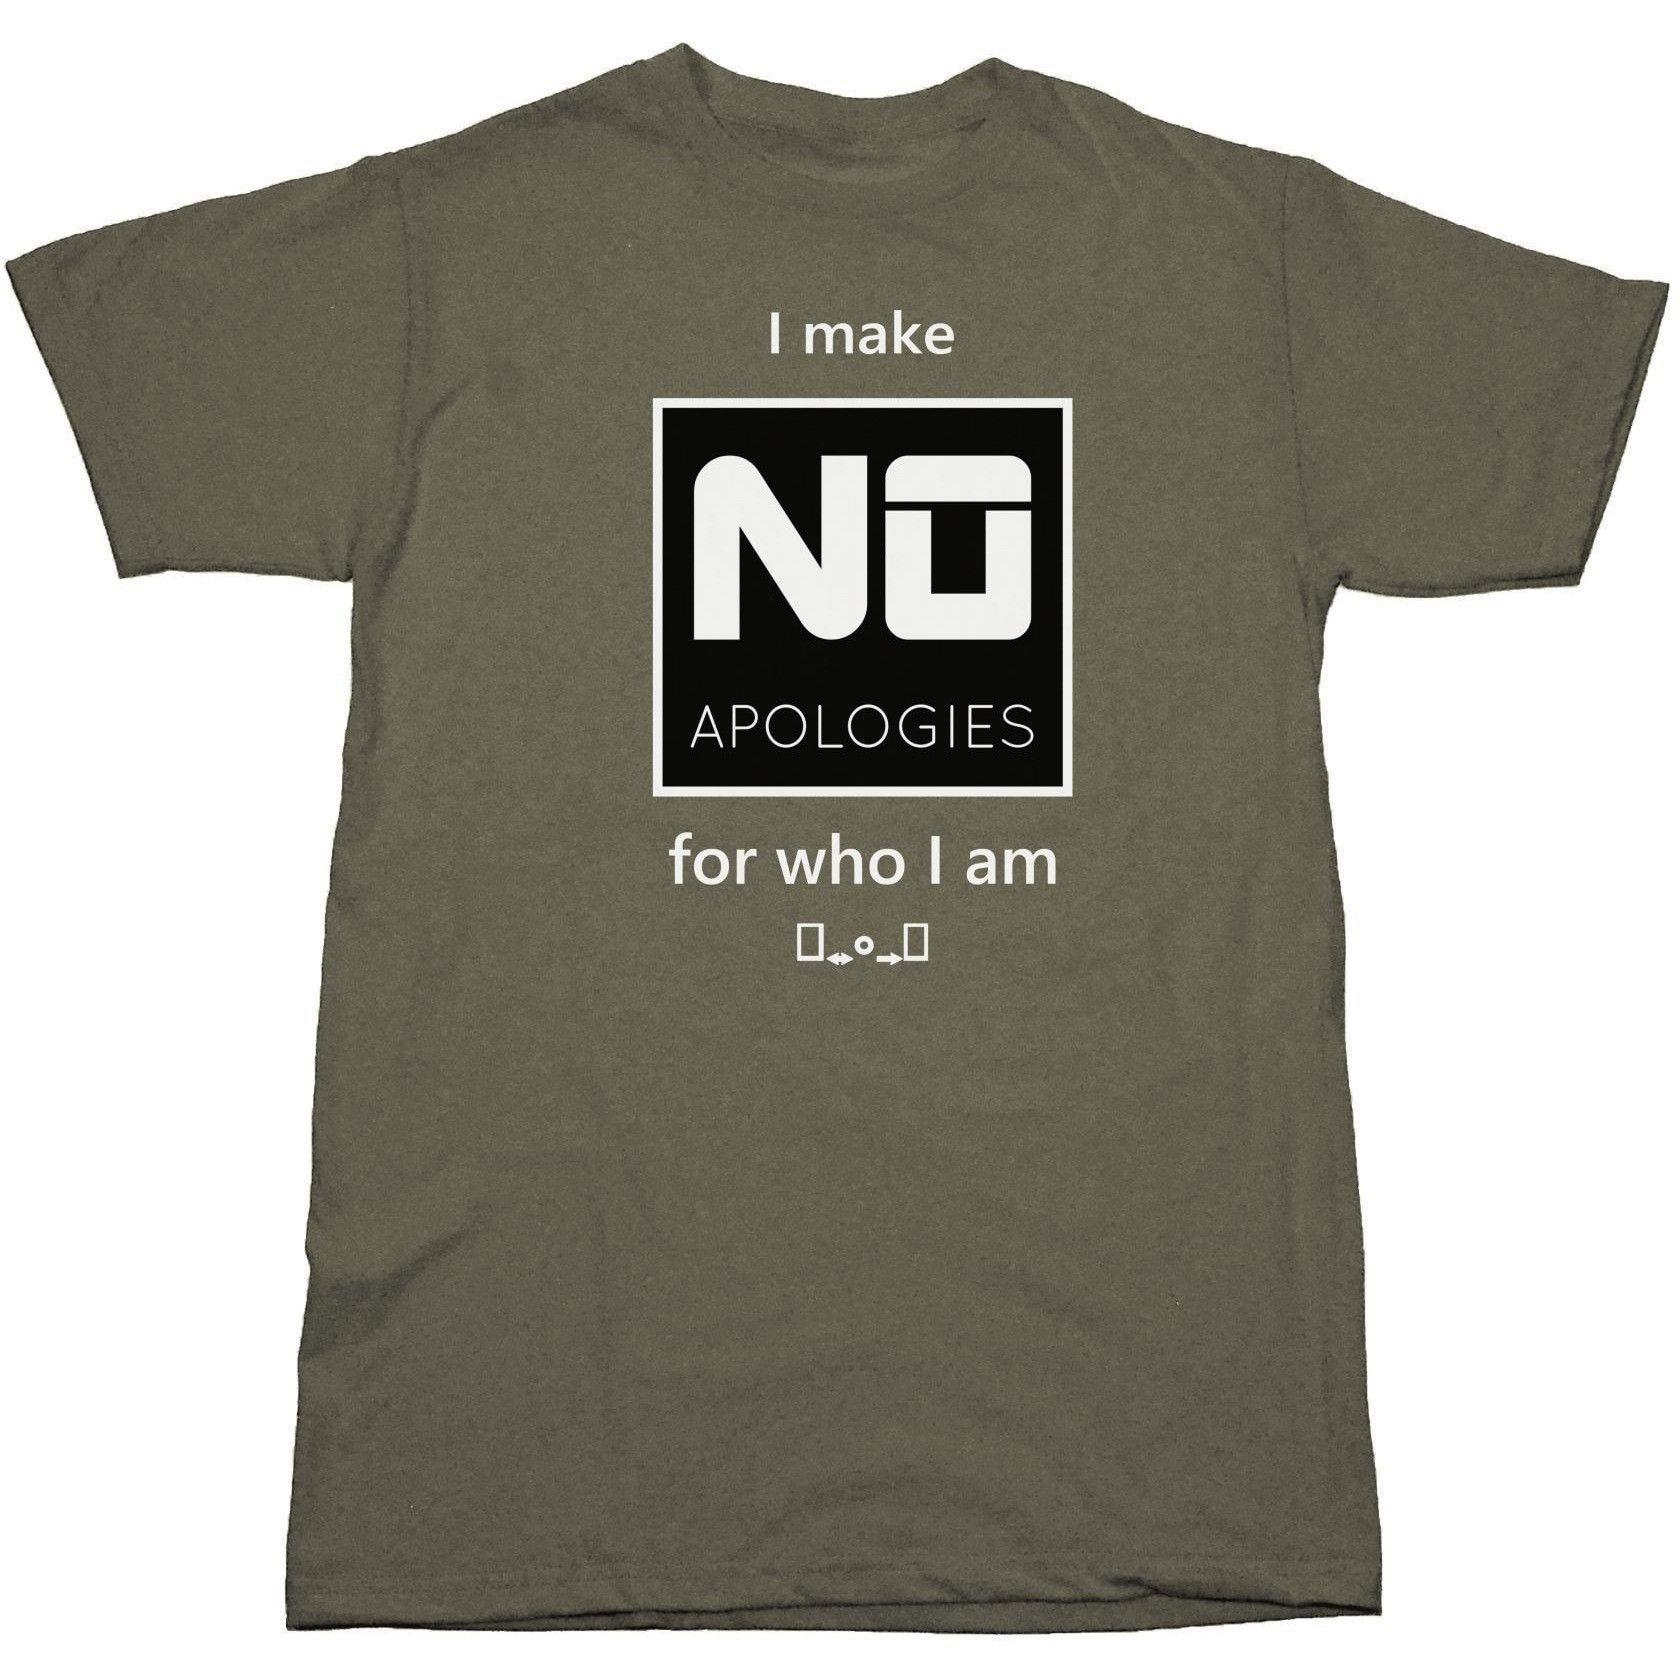 I MAKE NO APOLOGIES women's unisex t-shirt